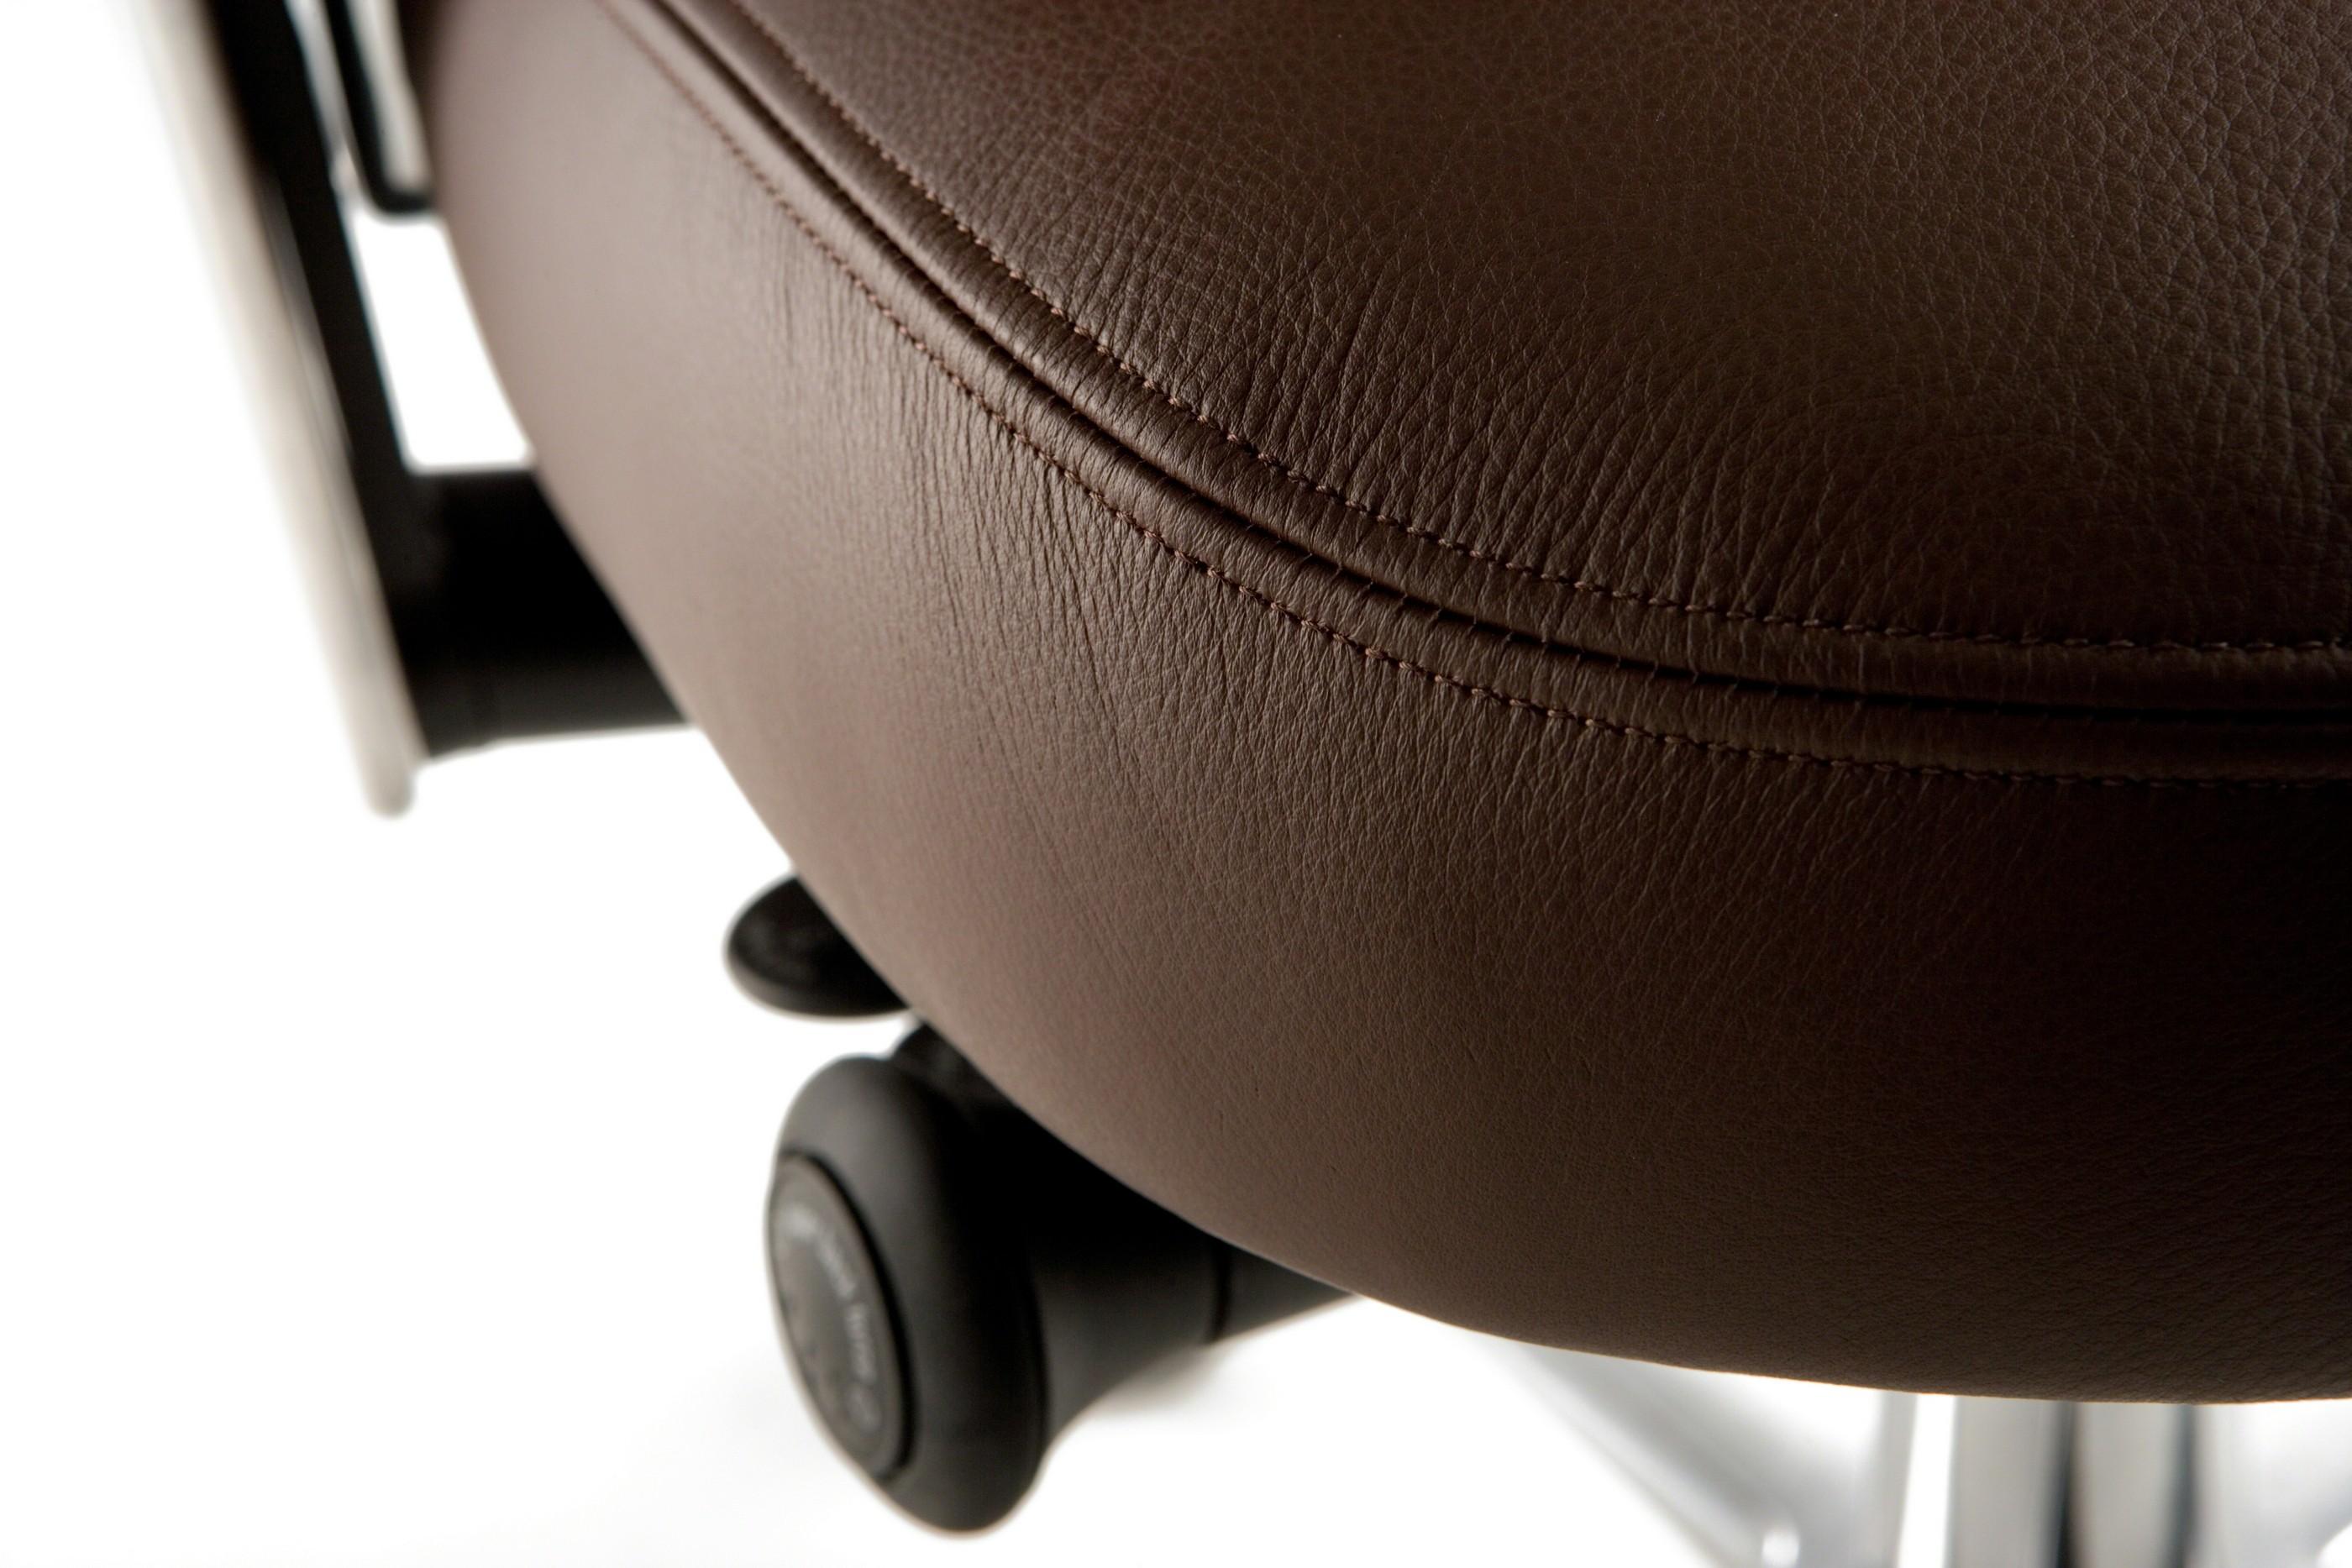 Phenomenal Steelcase Leap Worklounge Chair Creativecarmelina Interior Chair Design Creativecarmelinacom